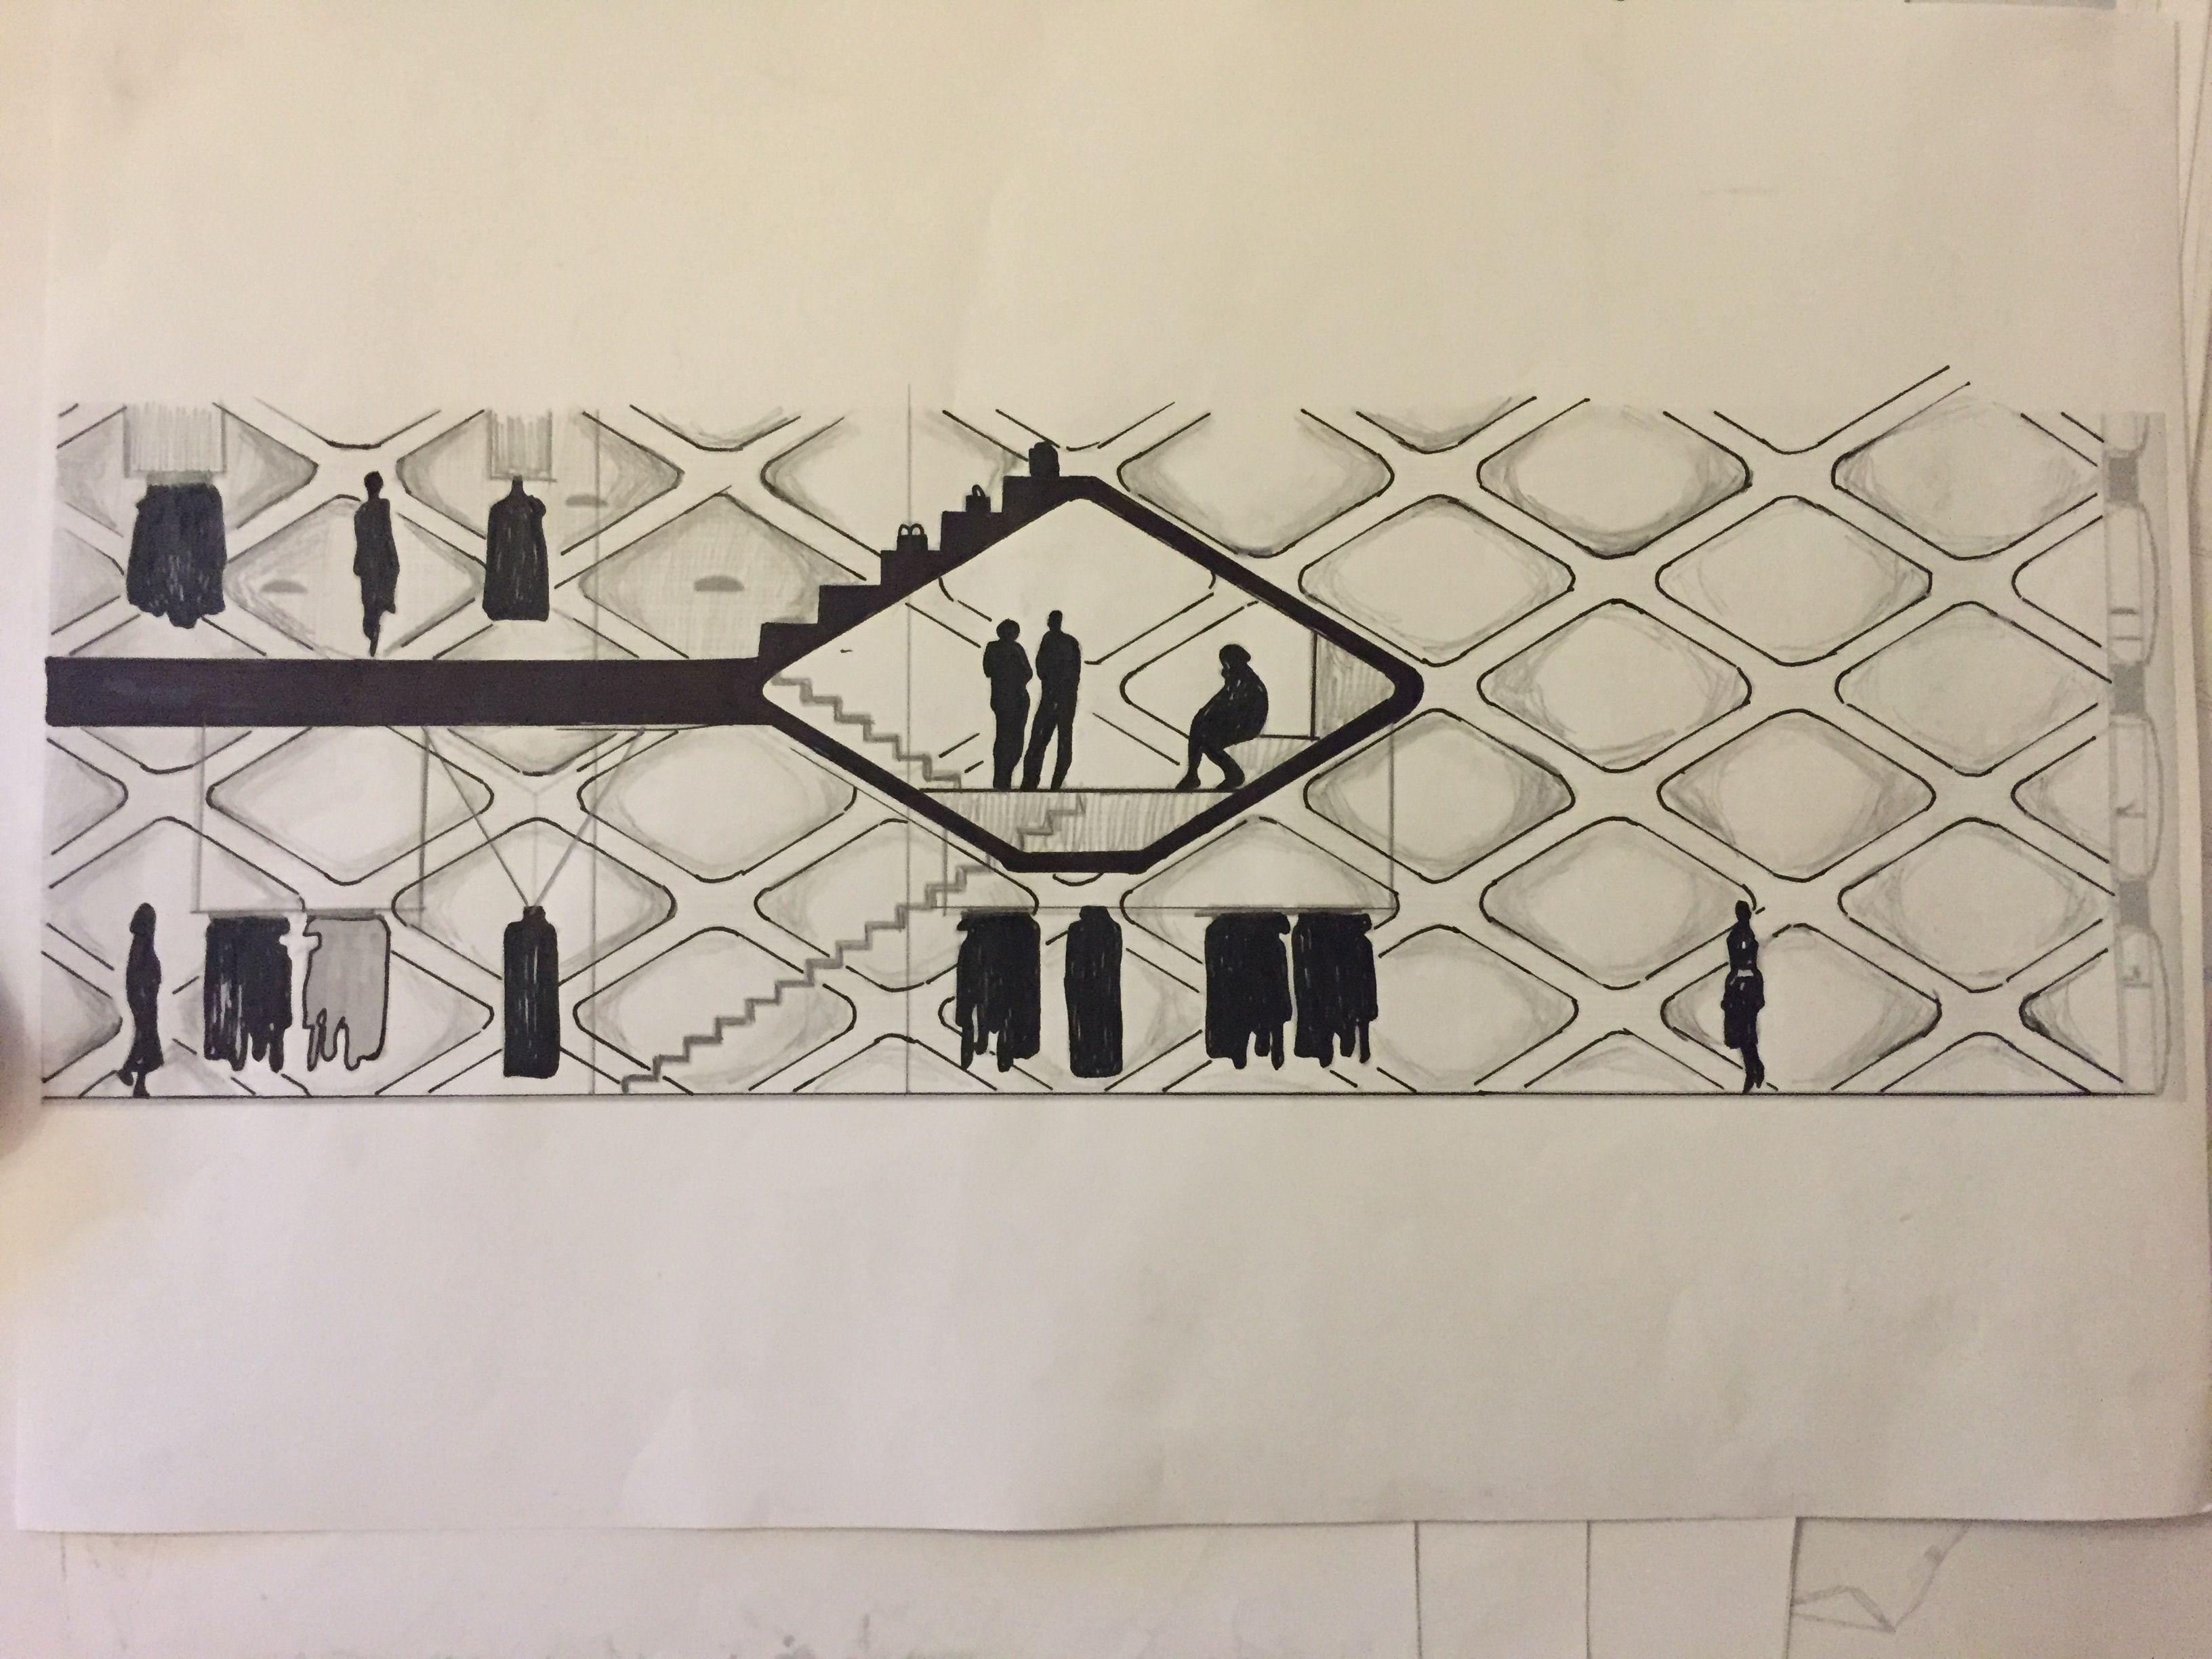 One Floor Sketch (section) of Prada Aoyama